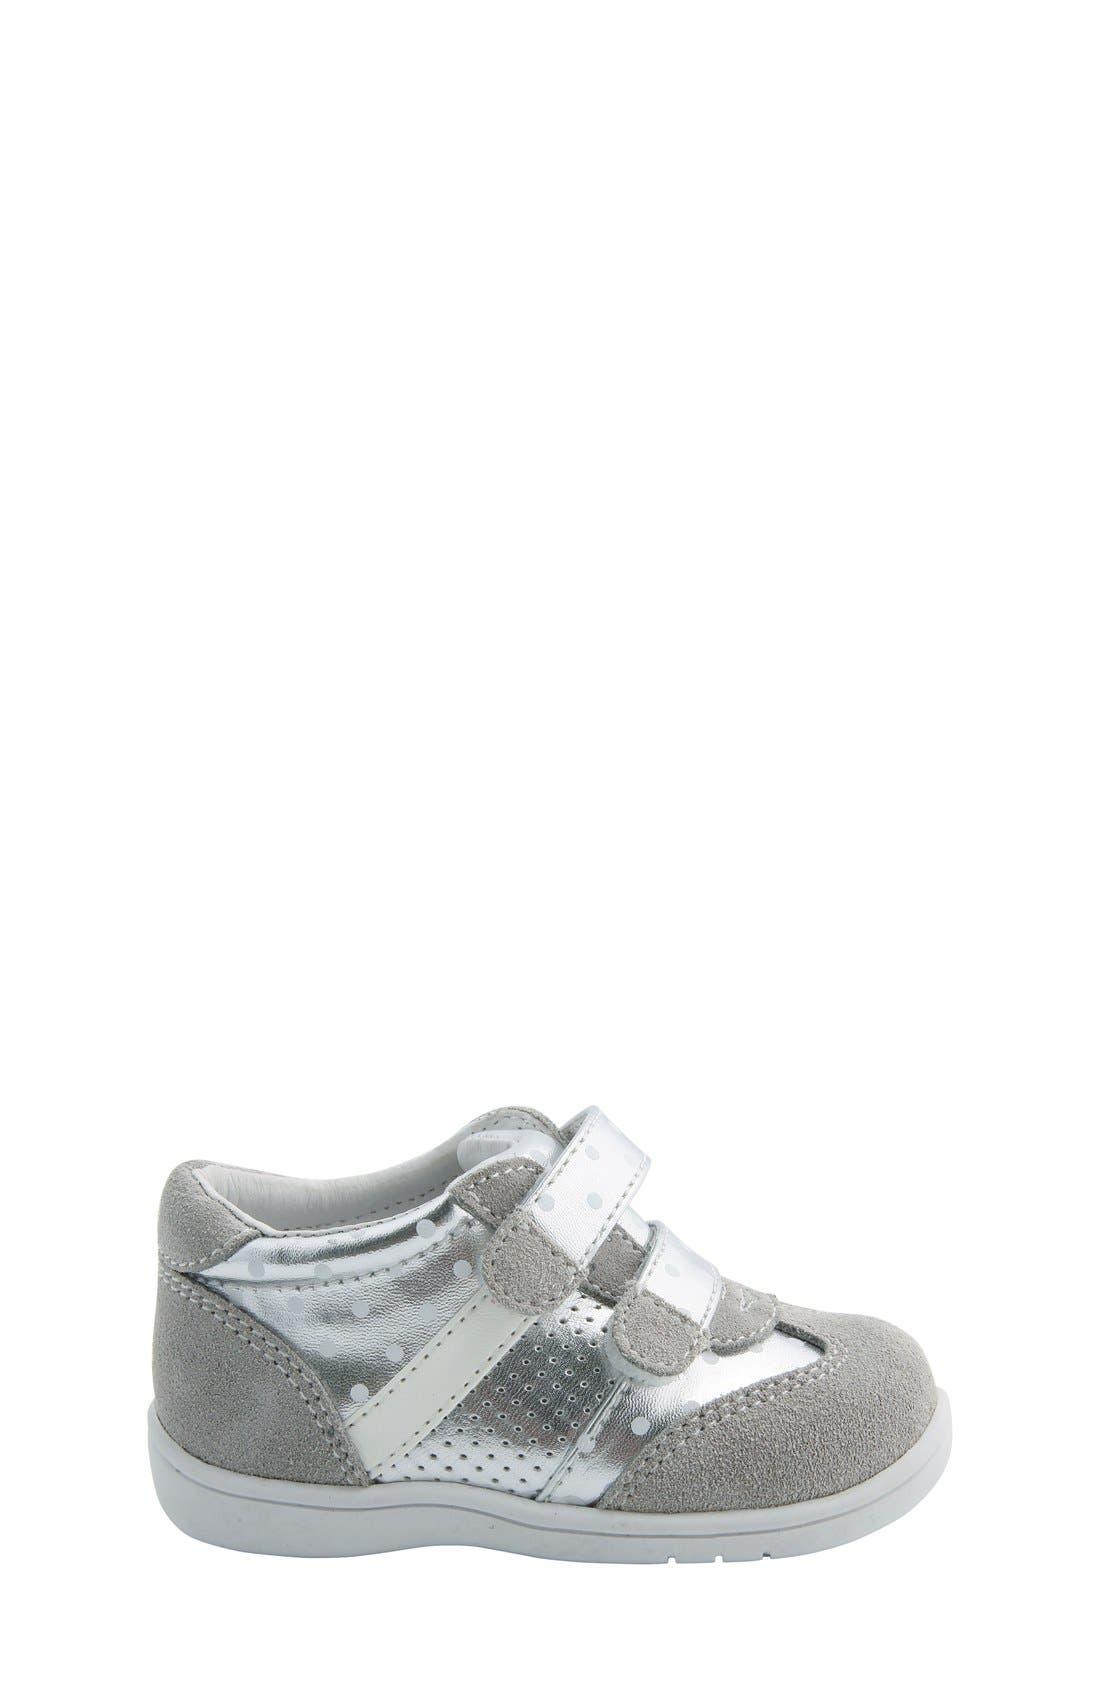 Nina 'Everest' Sneaker,                             Alternate thumbnail 2, color,                             Silver